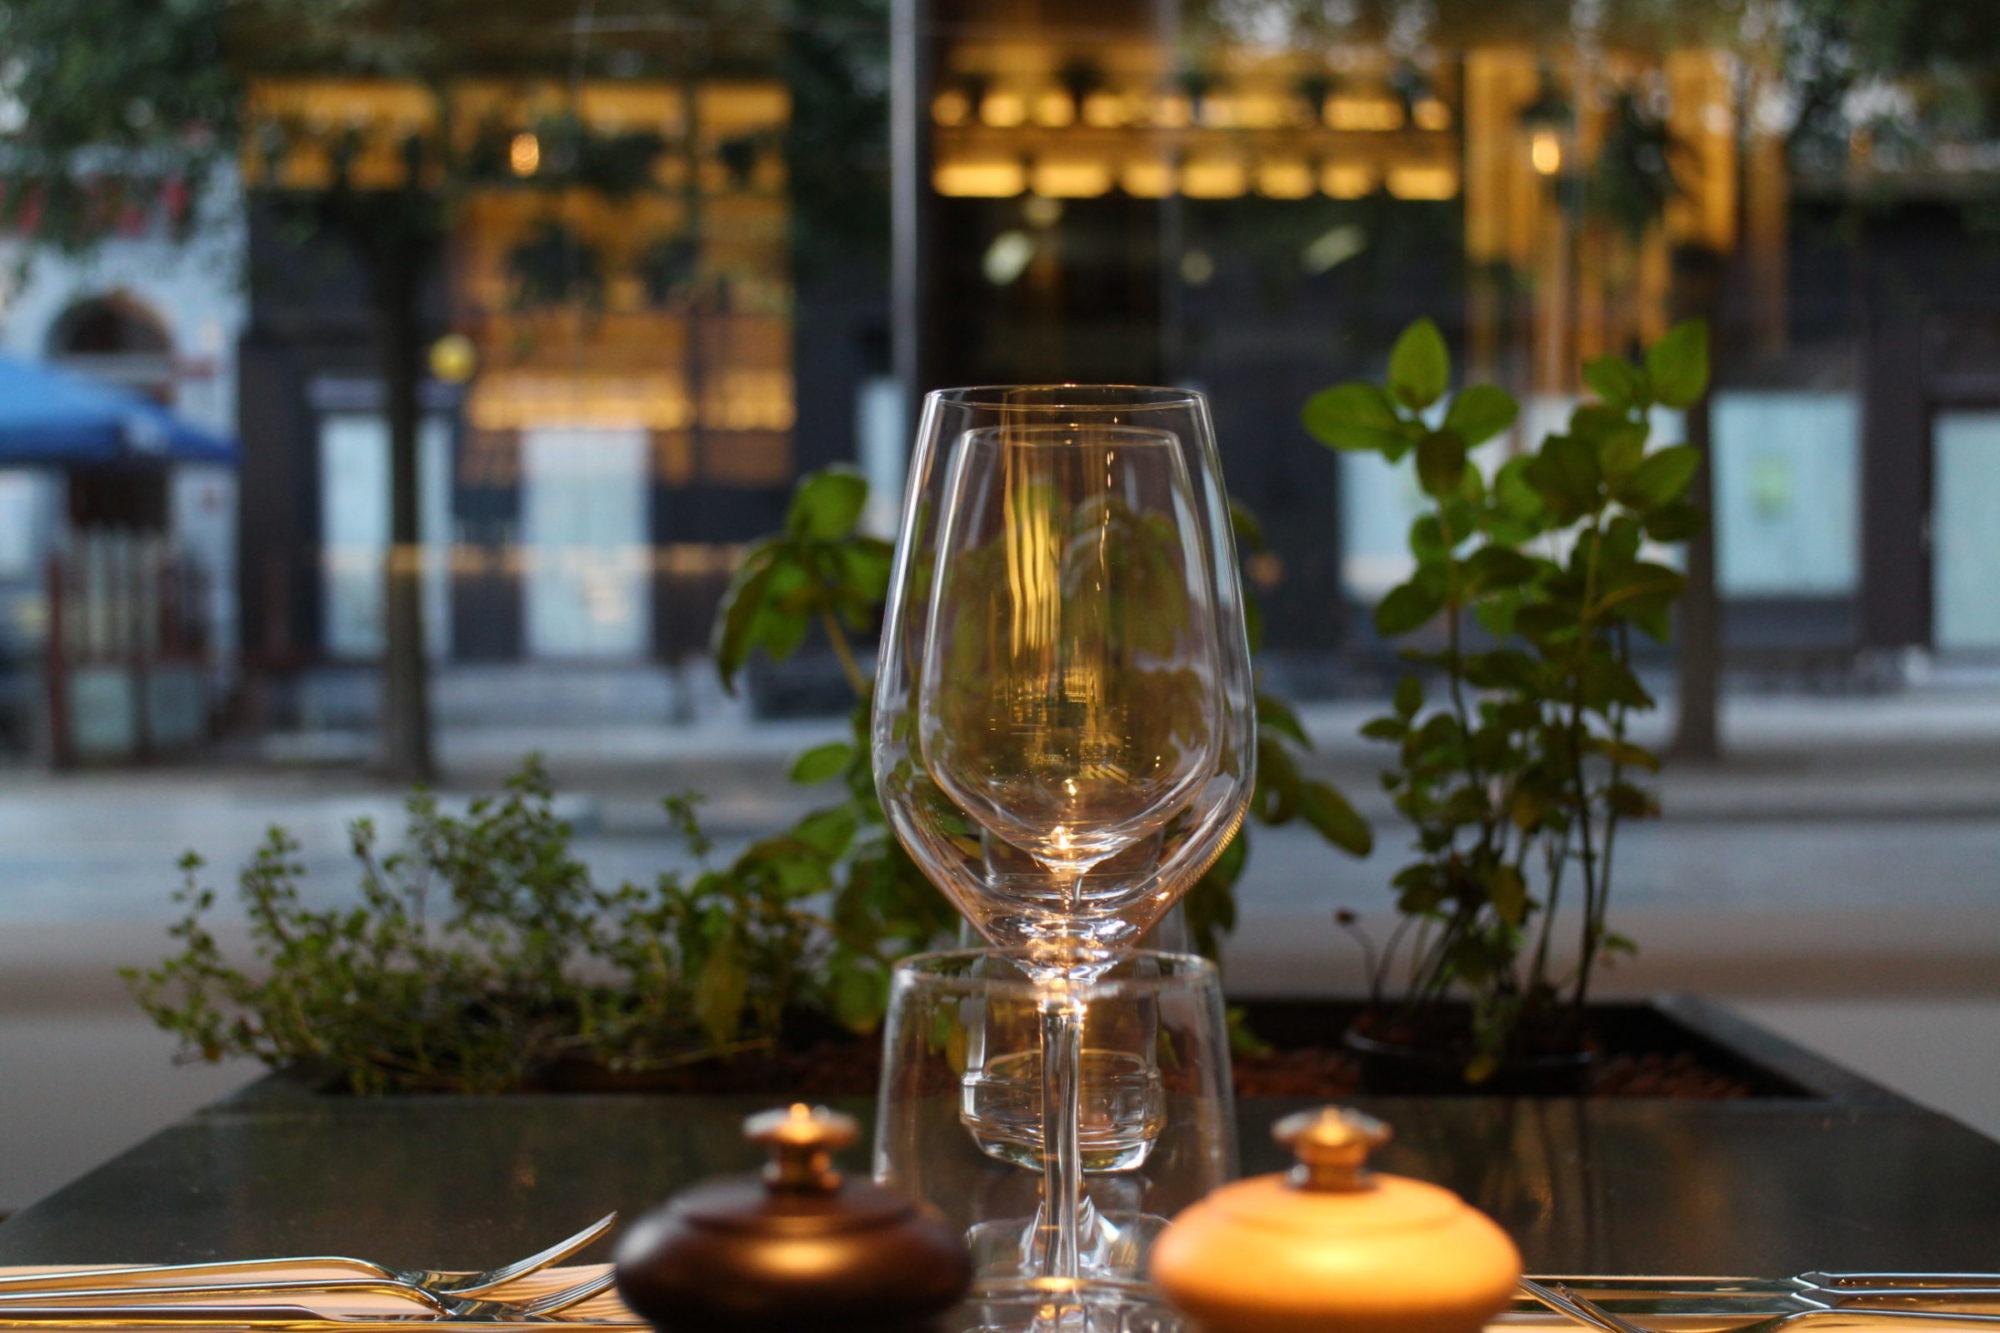 harvest bar à vins bruxelles wine bar brussels wijnbar brussel espace table